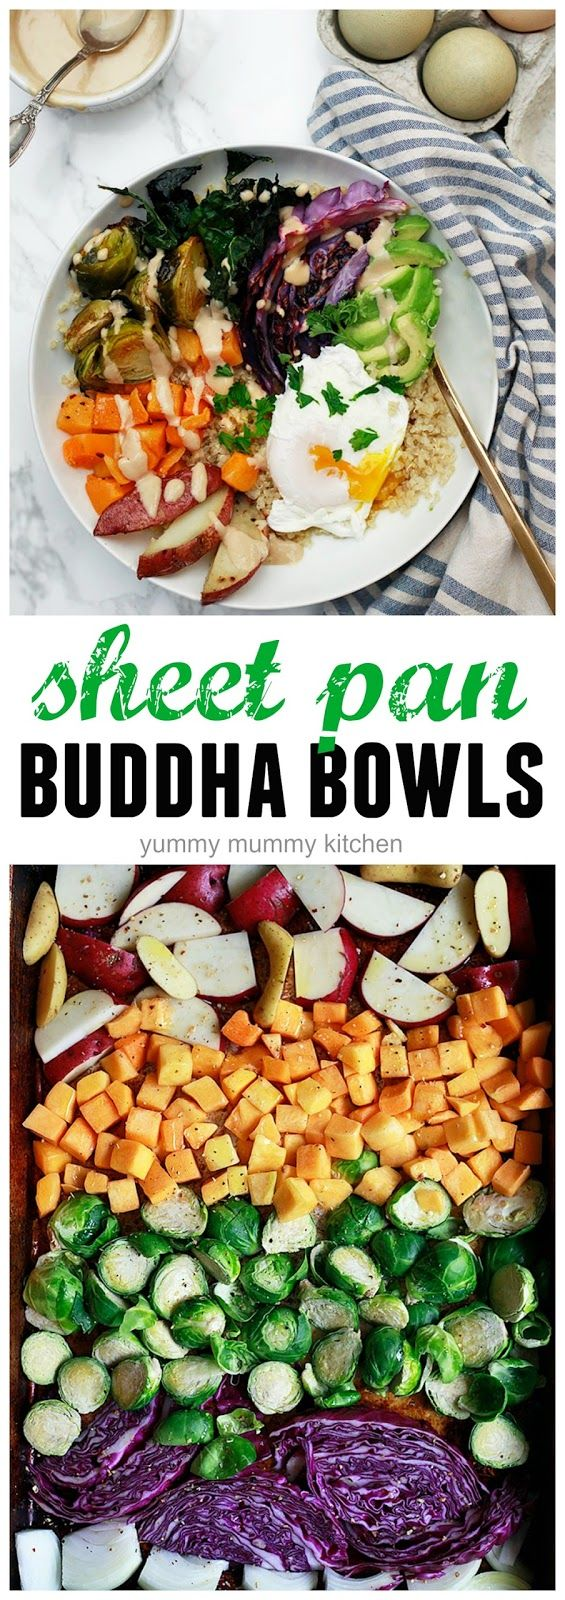 Sheet Pan Winter Buddha Bowls with Tahini Sauce | Yummy Mummy Kitchen | A Vibrant Vegetarian Blog